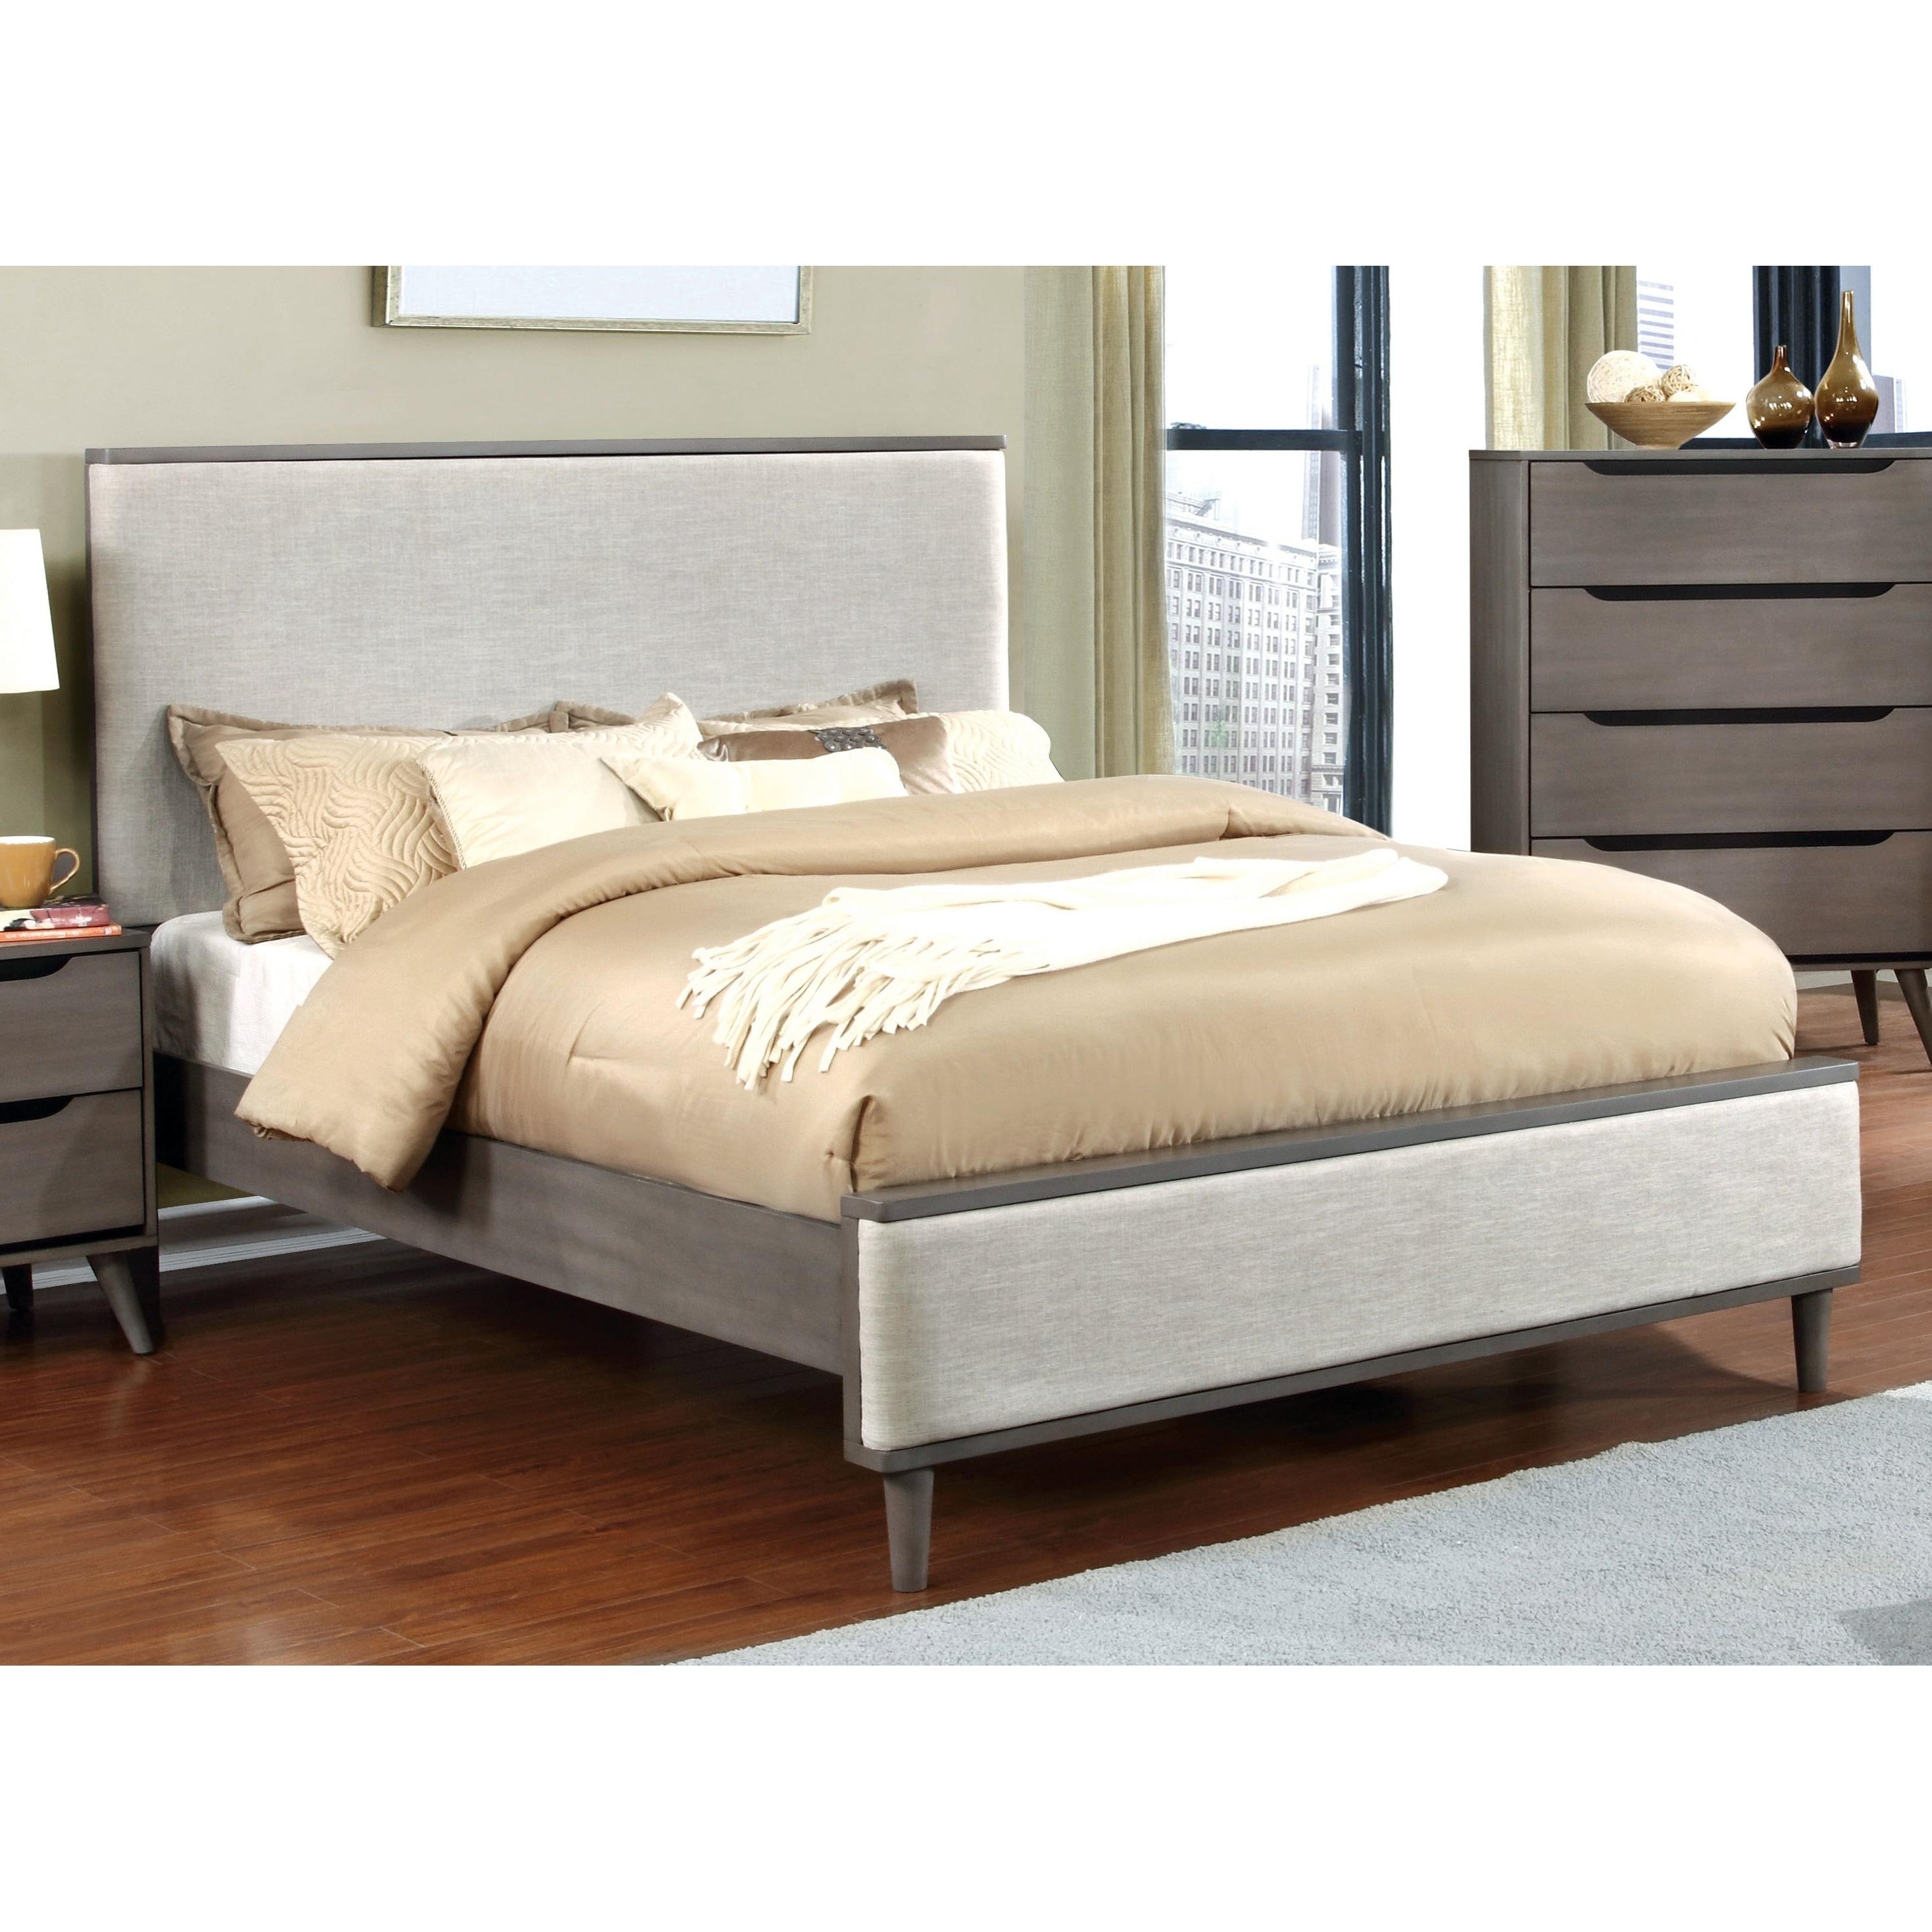 Mid Century Modern Bed: Shop Furniture Of America Corrine II Mid-Century Modern